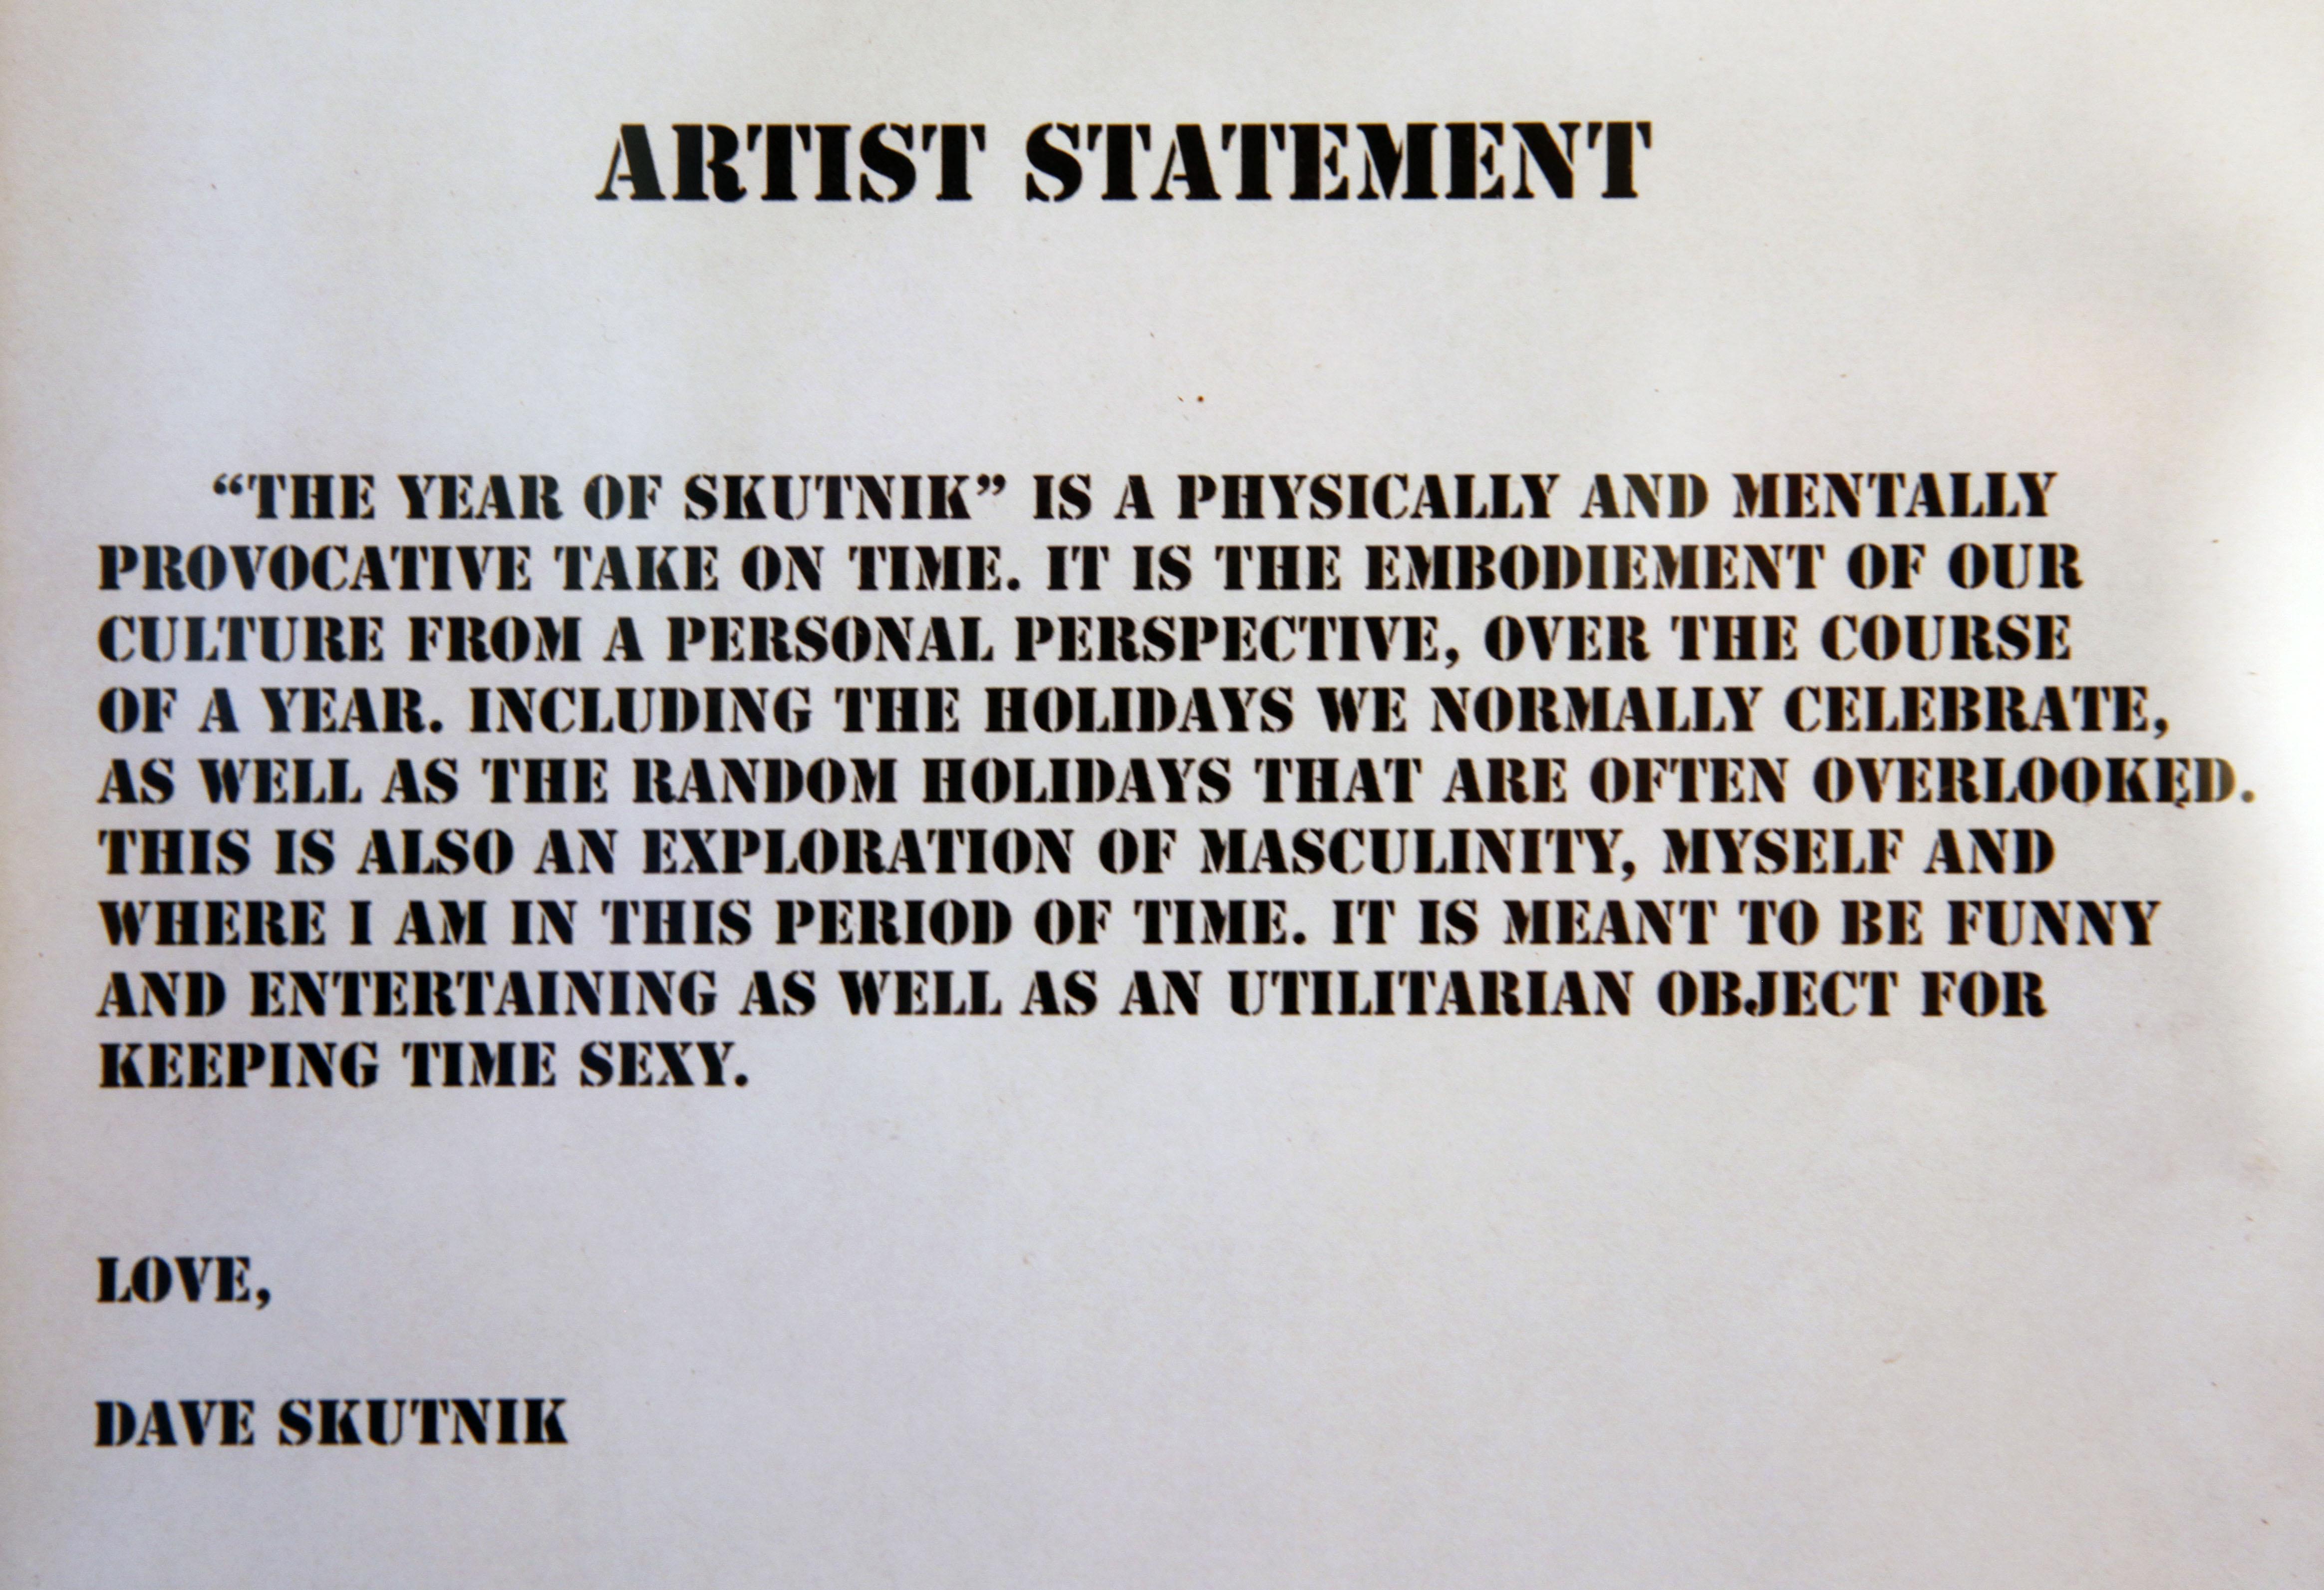 October 2010 CSU Photo – Sample Artist Statement